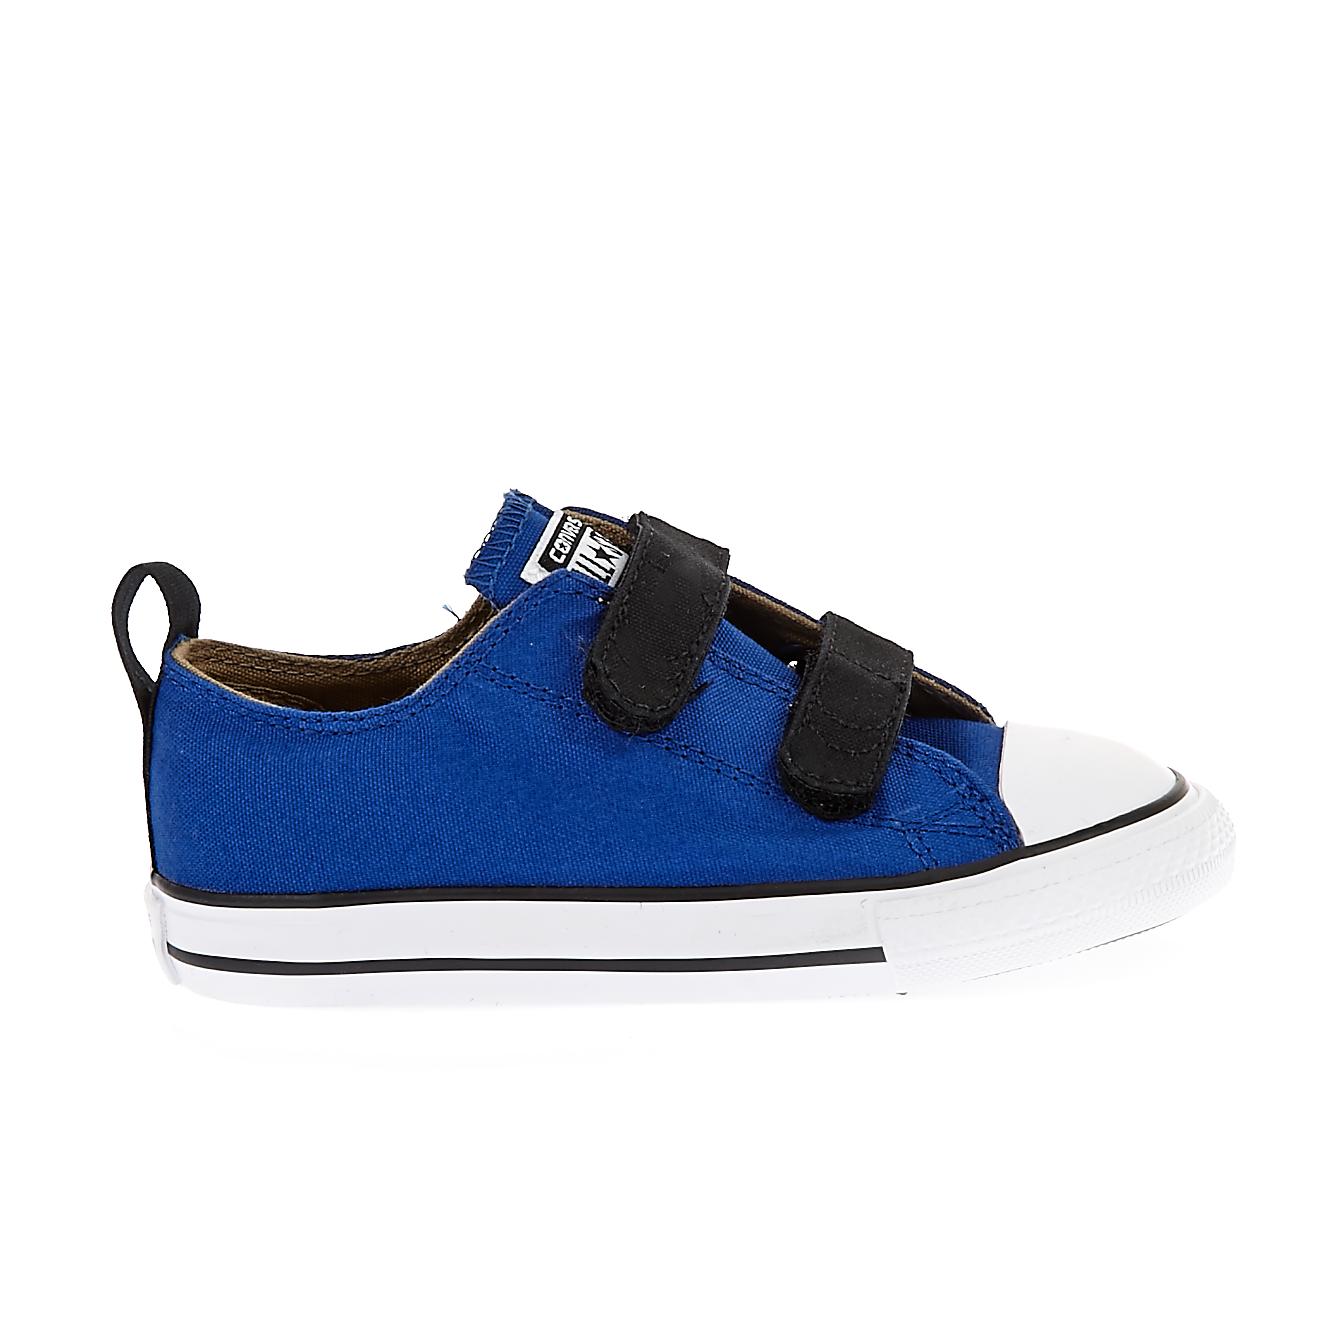 CONVERSE – Βρεφικά παπούτσια Chuck Taylor All Star 2V Ox μπλε